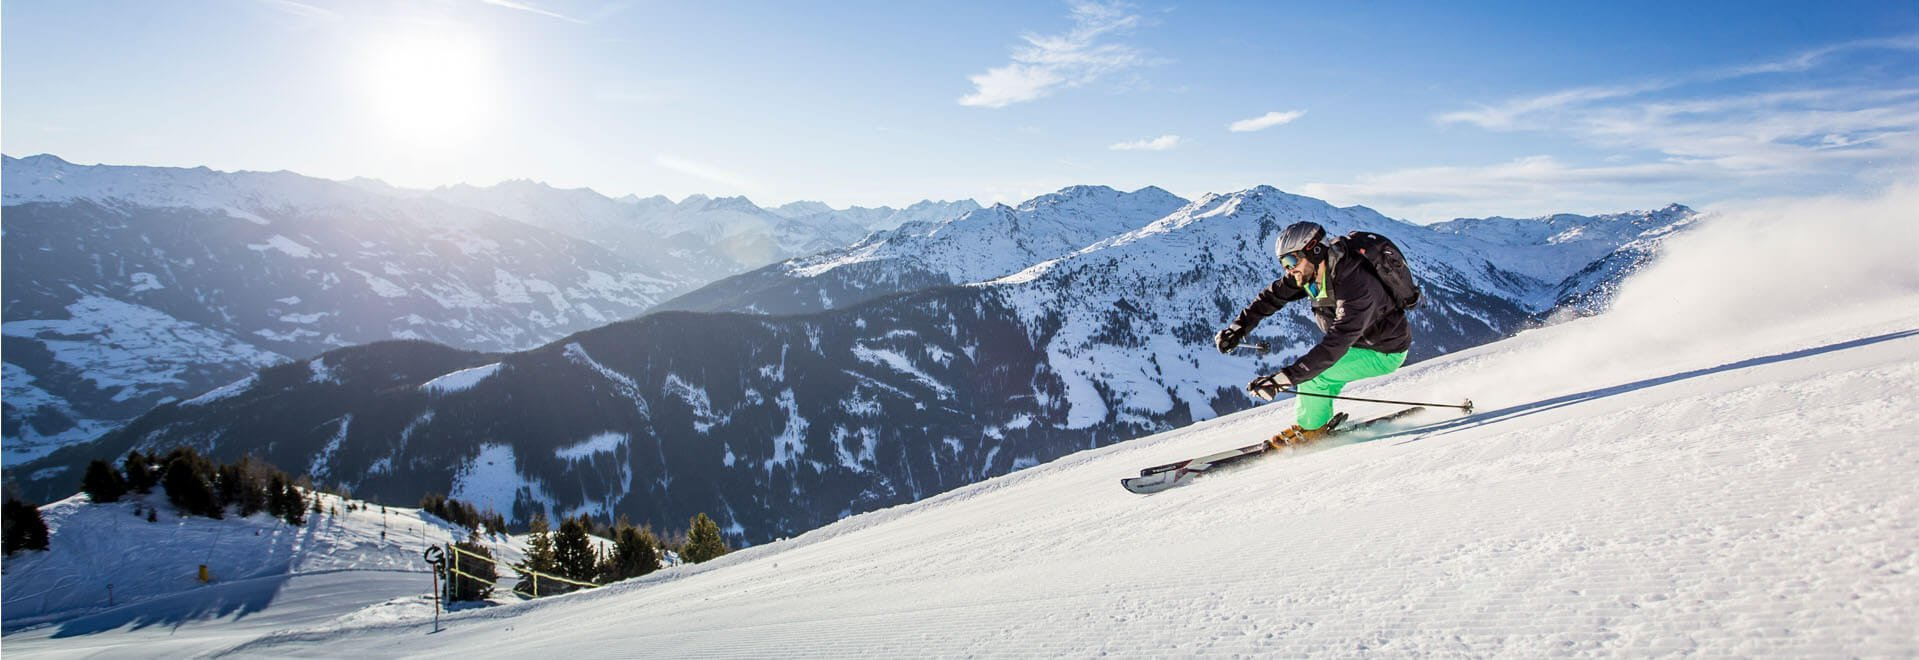 Skigebiet Spieljoch Zillertal